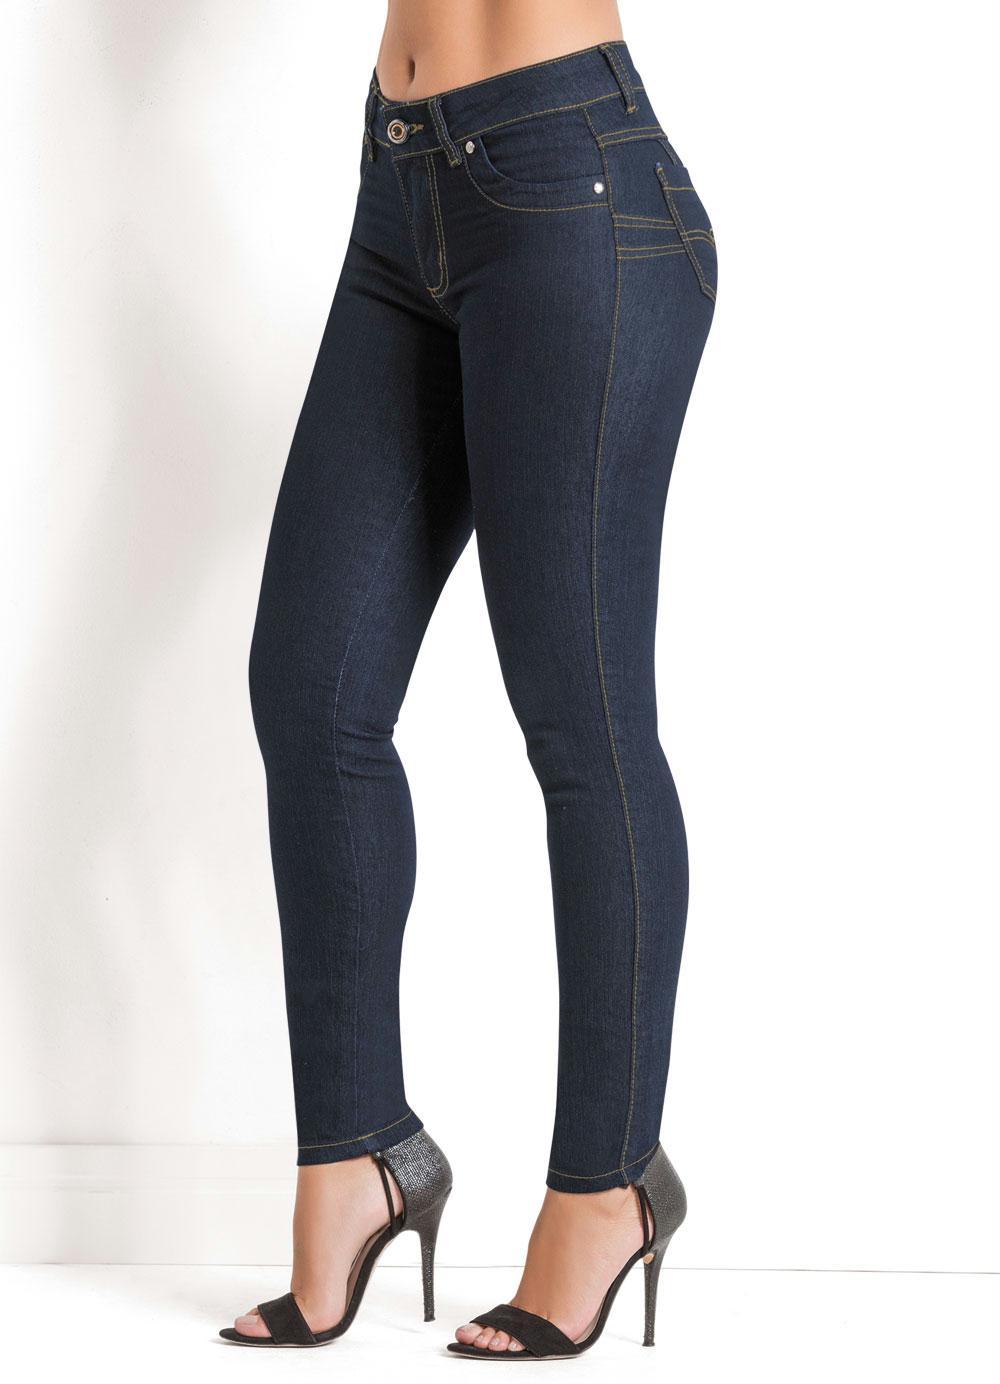 cd3442edd Calça Jeans Sawary Azul Escuro Levanta Bumbum - Sawary Jeans